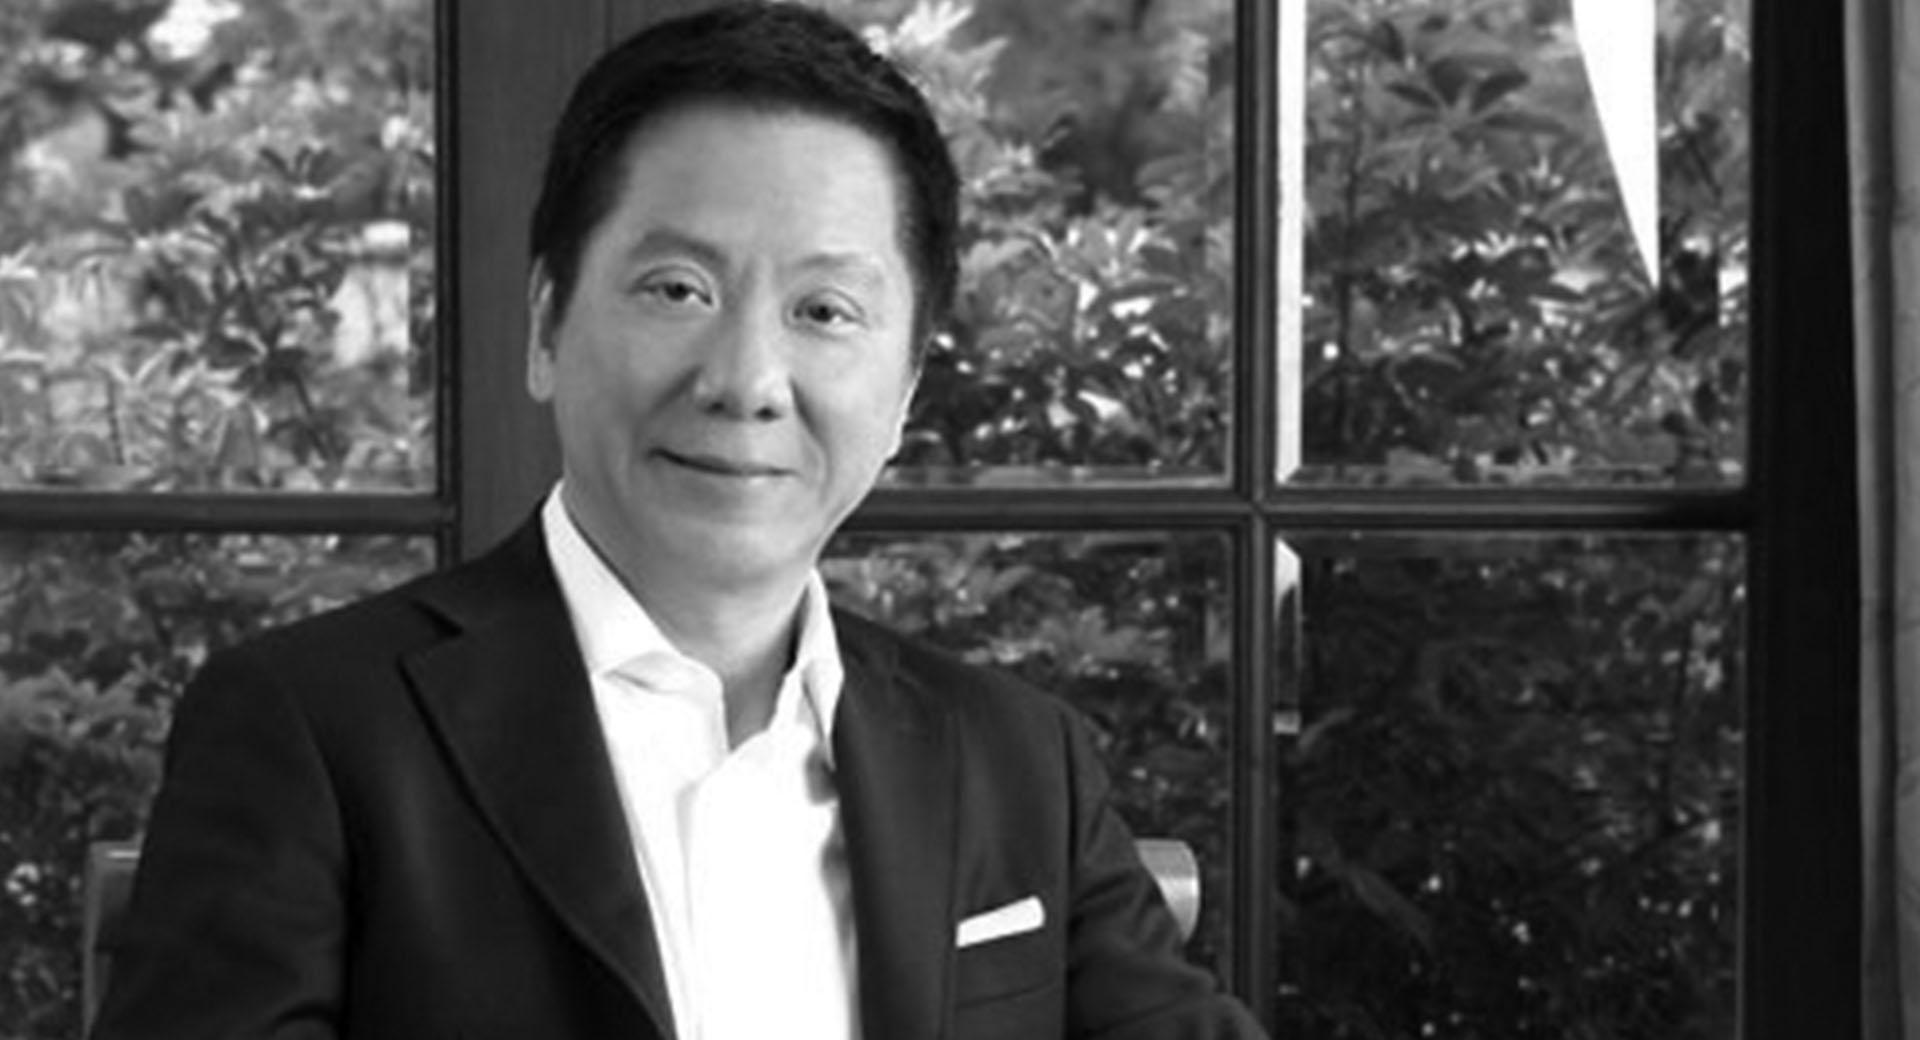 Mr. Andrew L. Tan